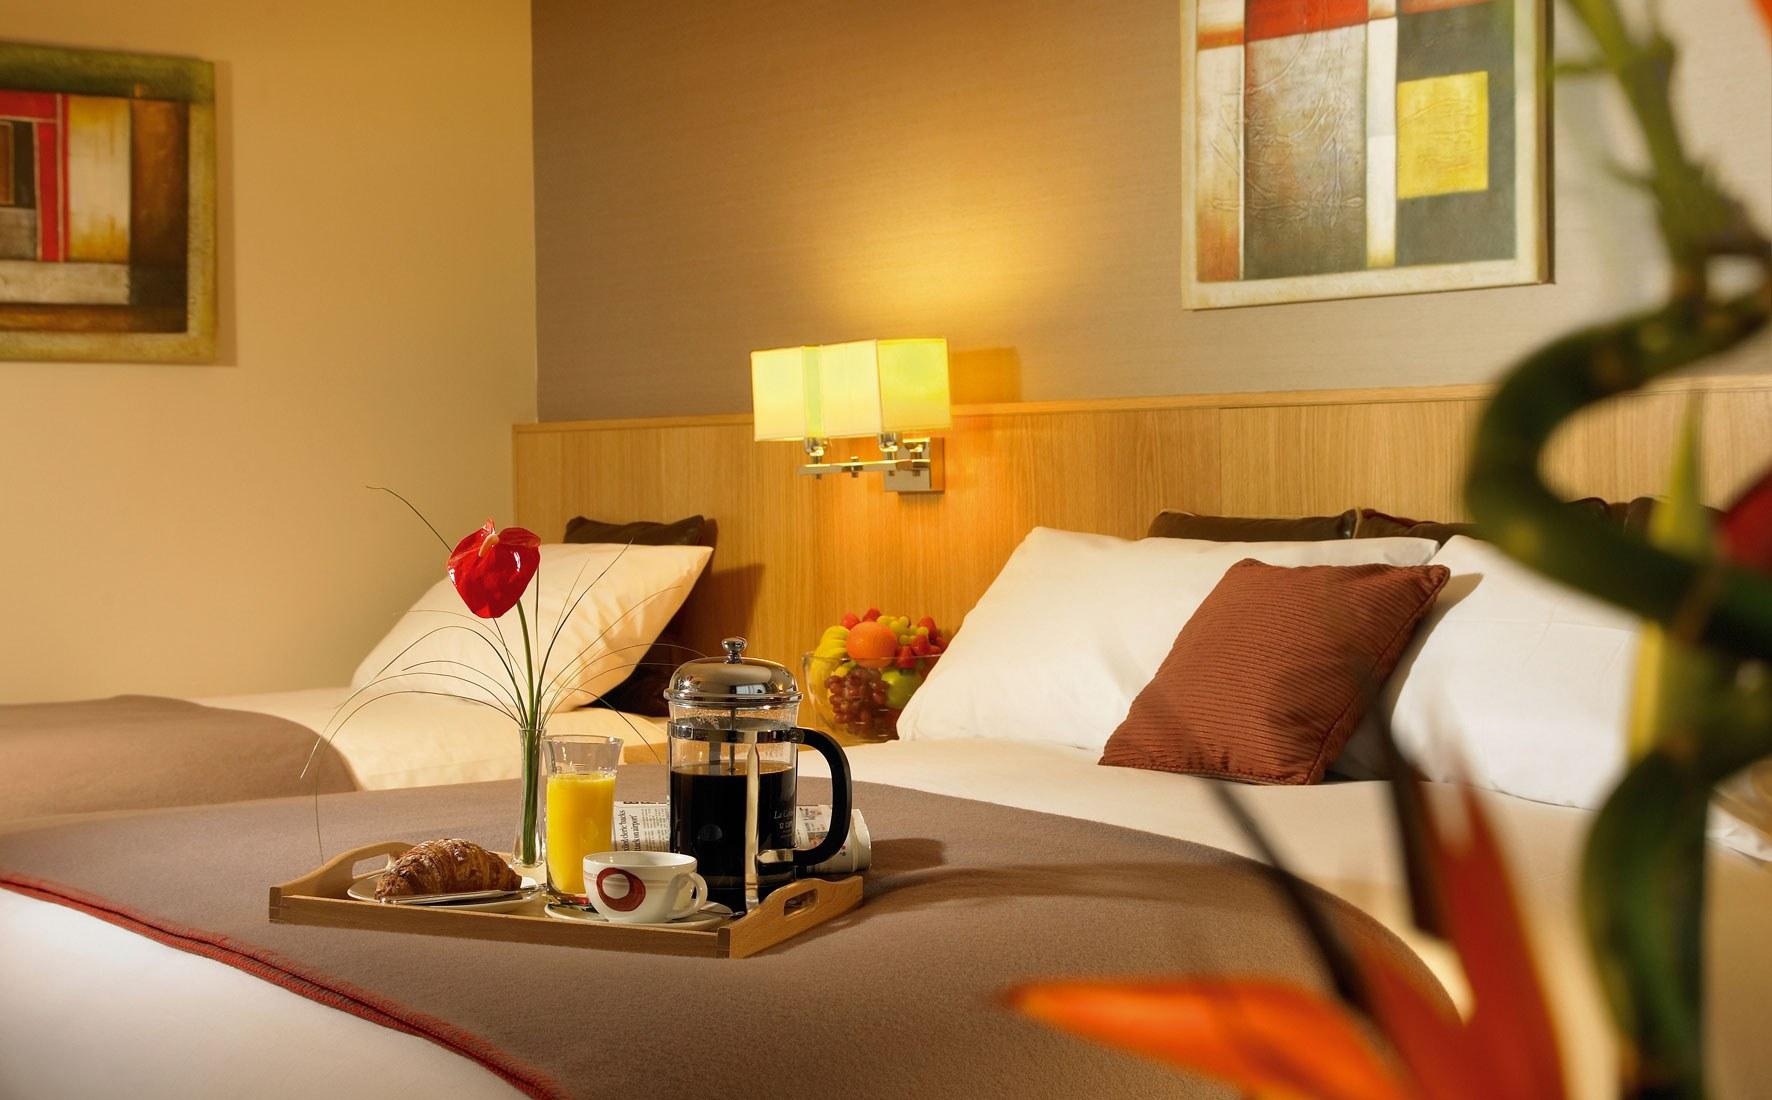 Citynorth Hotel Dublin Groom Pro Ireland